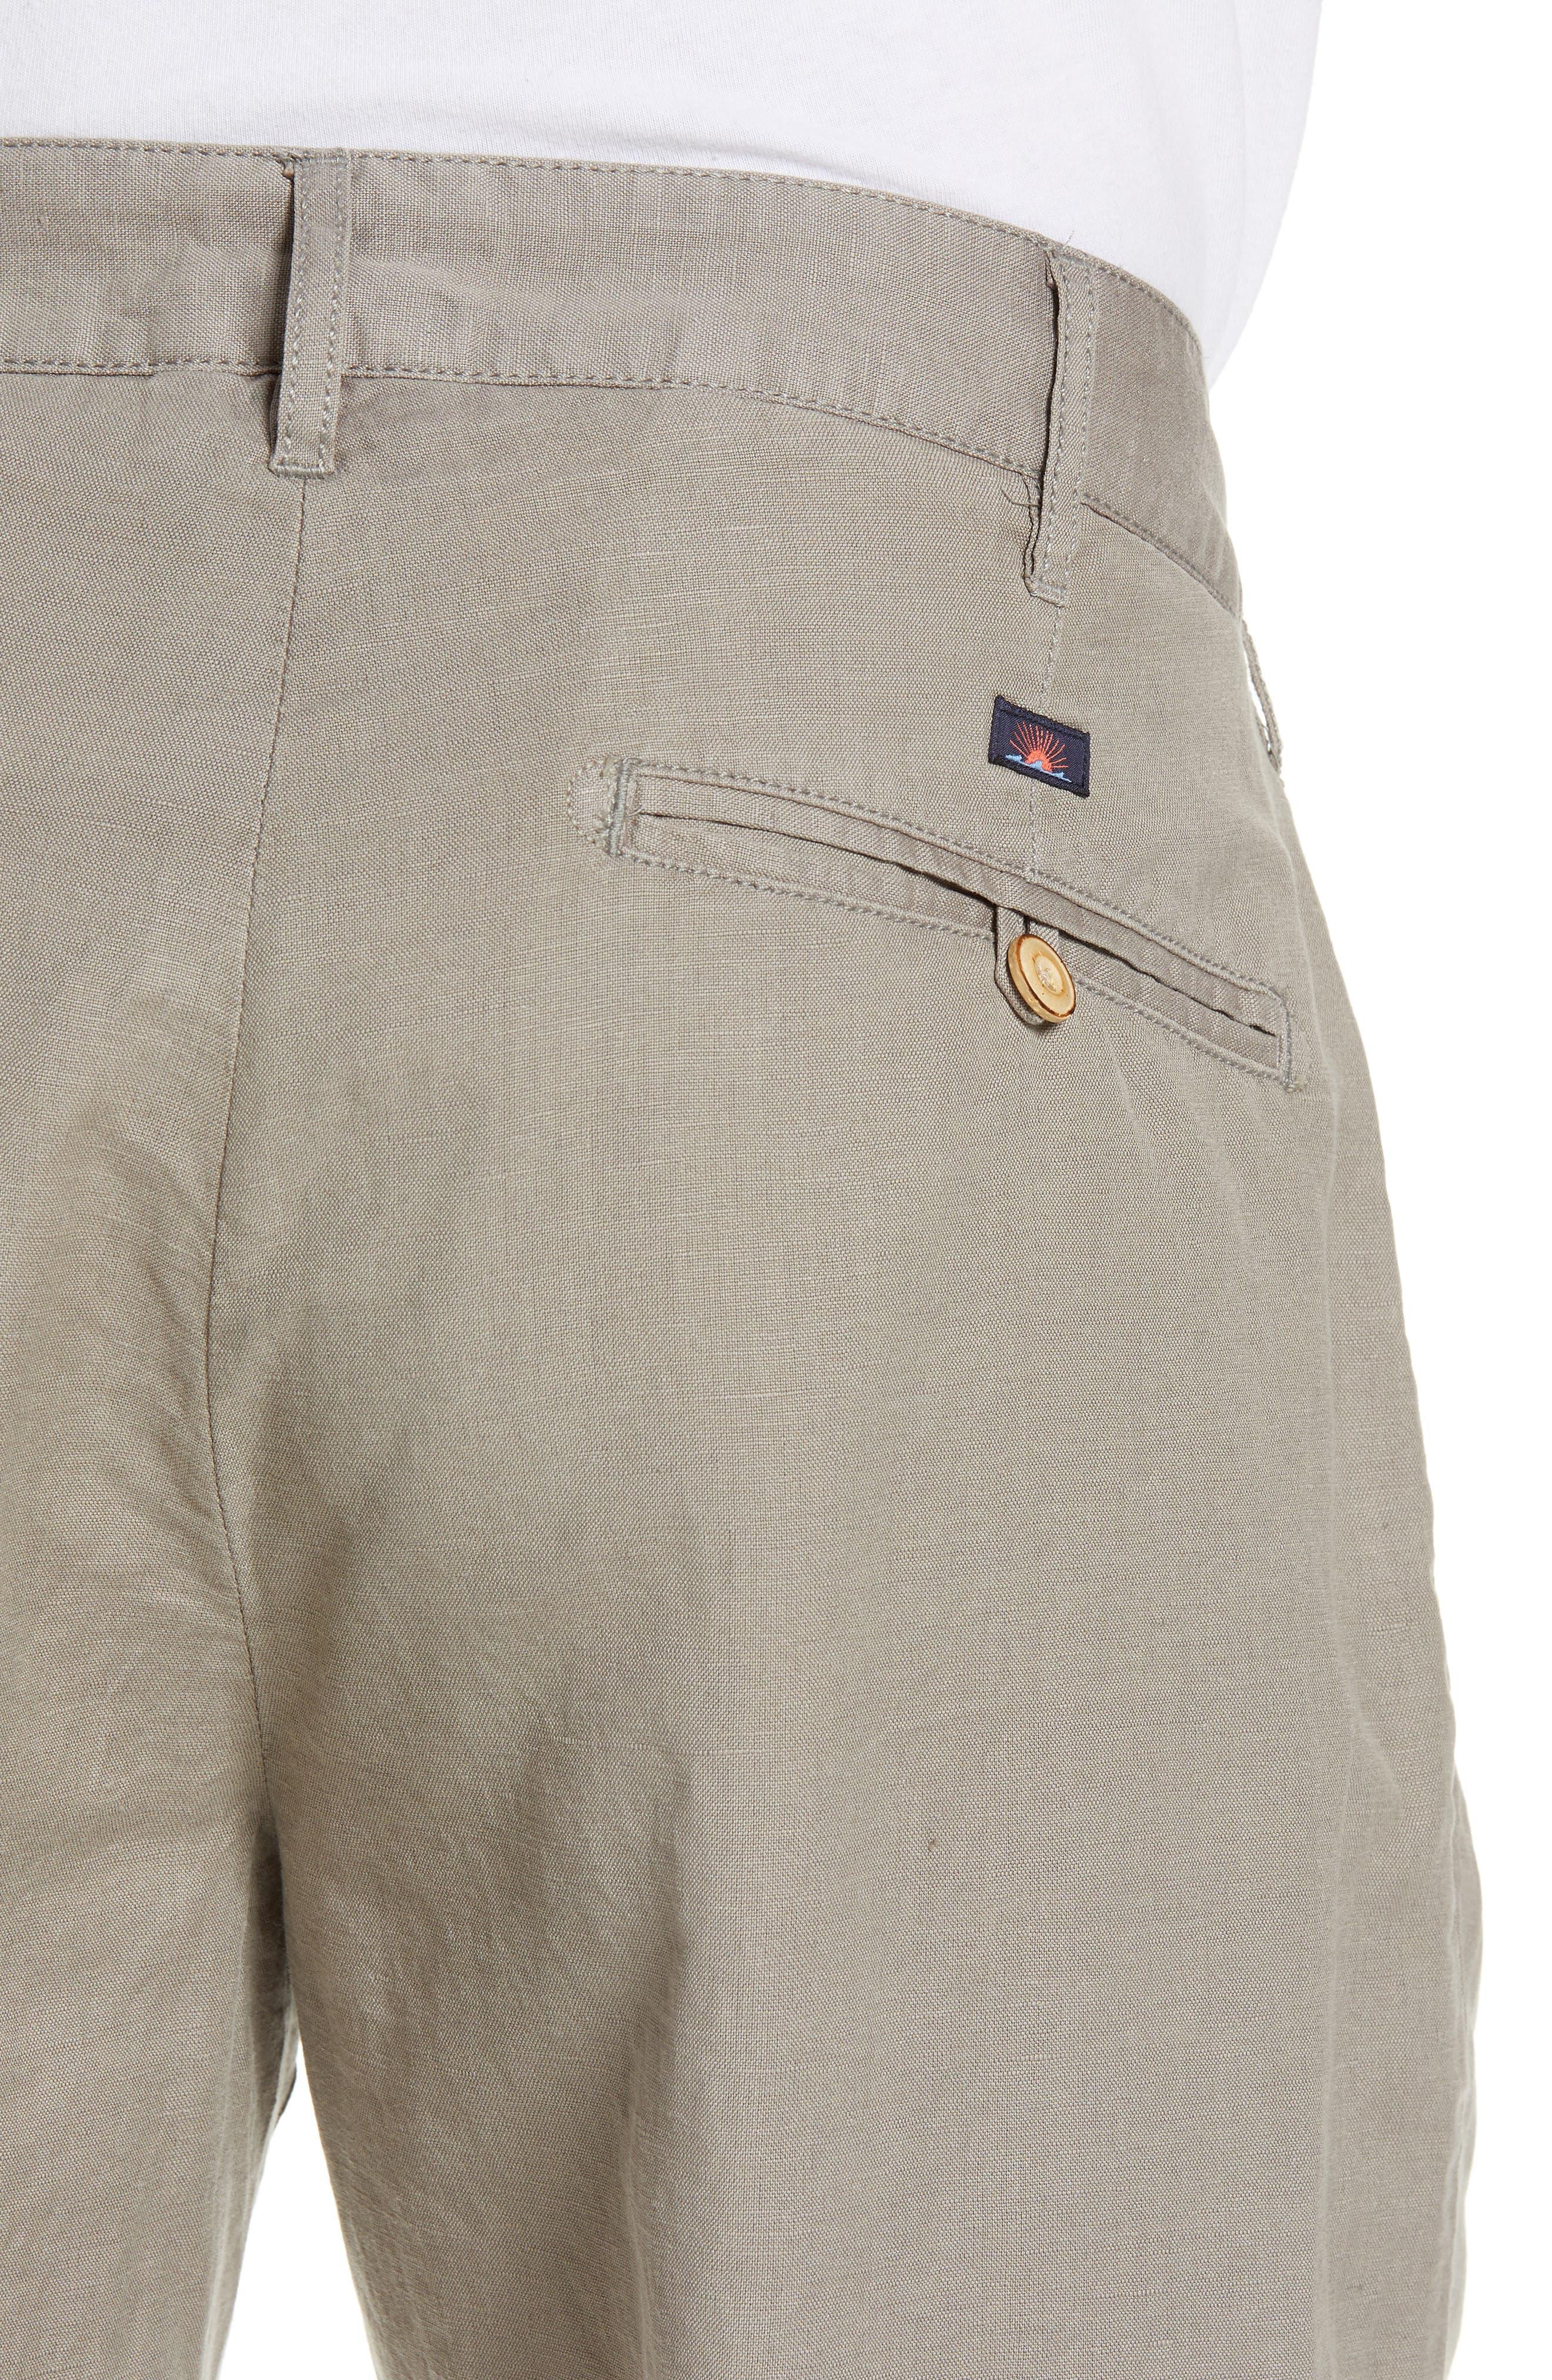 Malibu Shorts,                             Alternate thumbnail 4, color,                             GREY